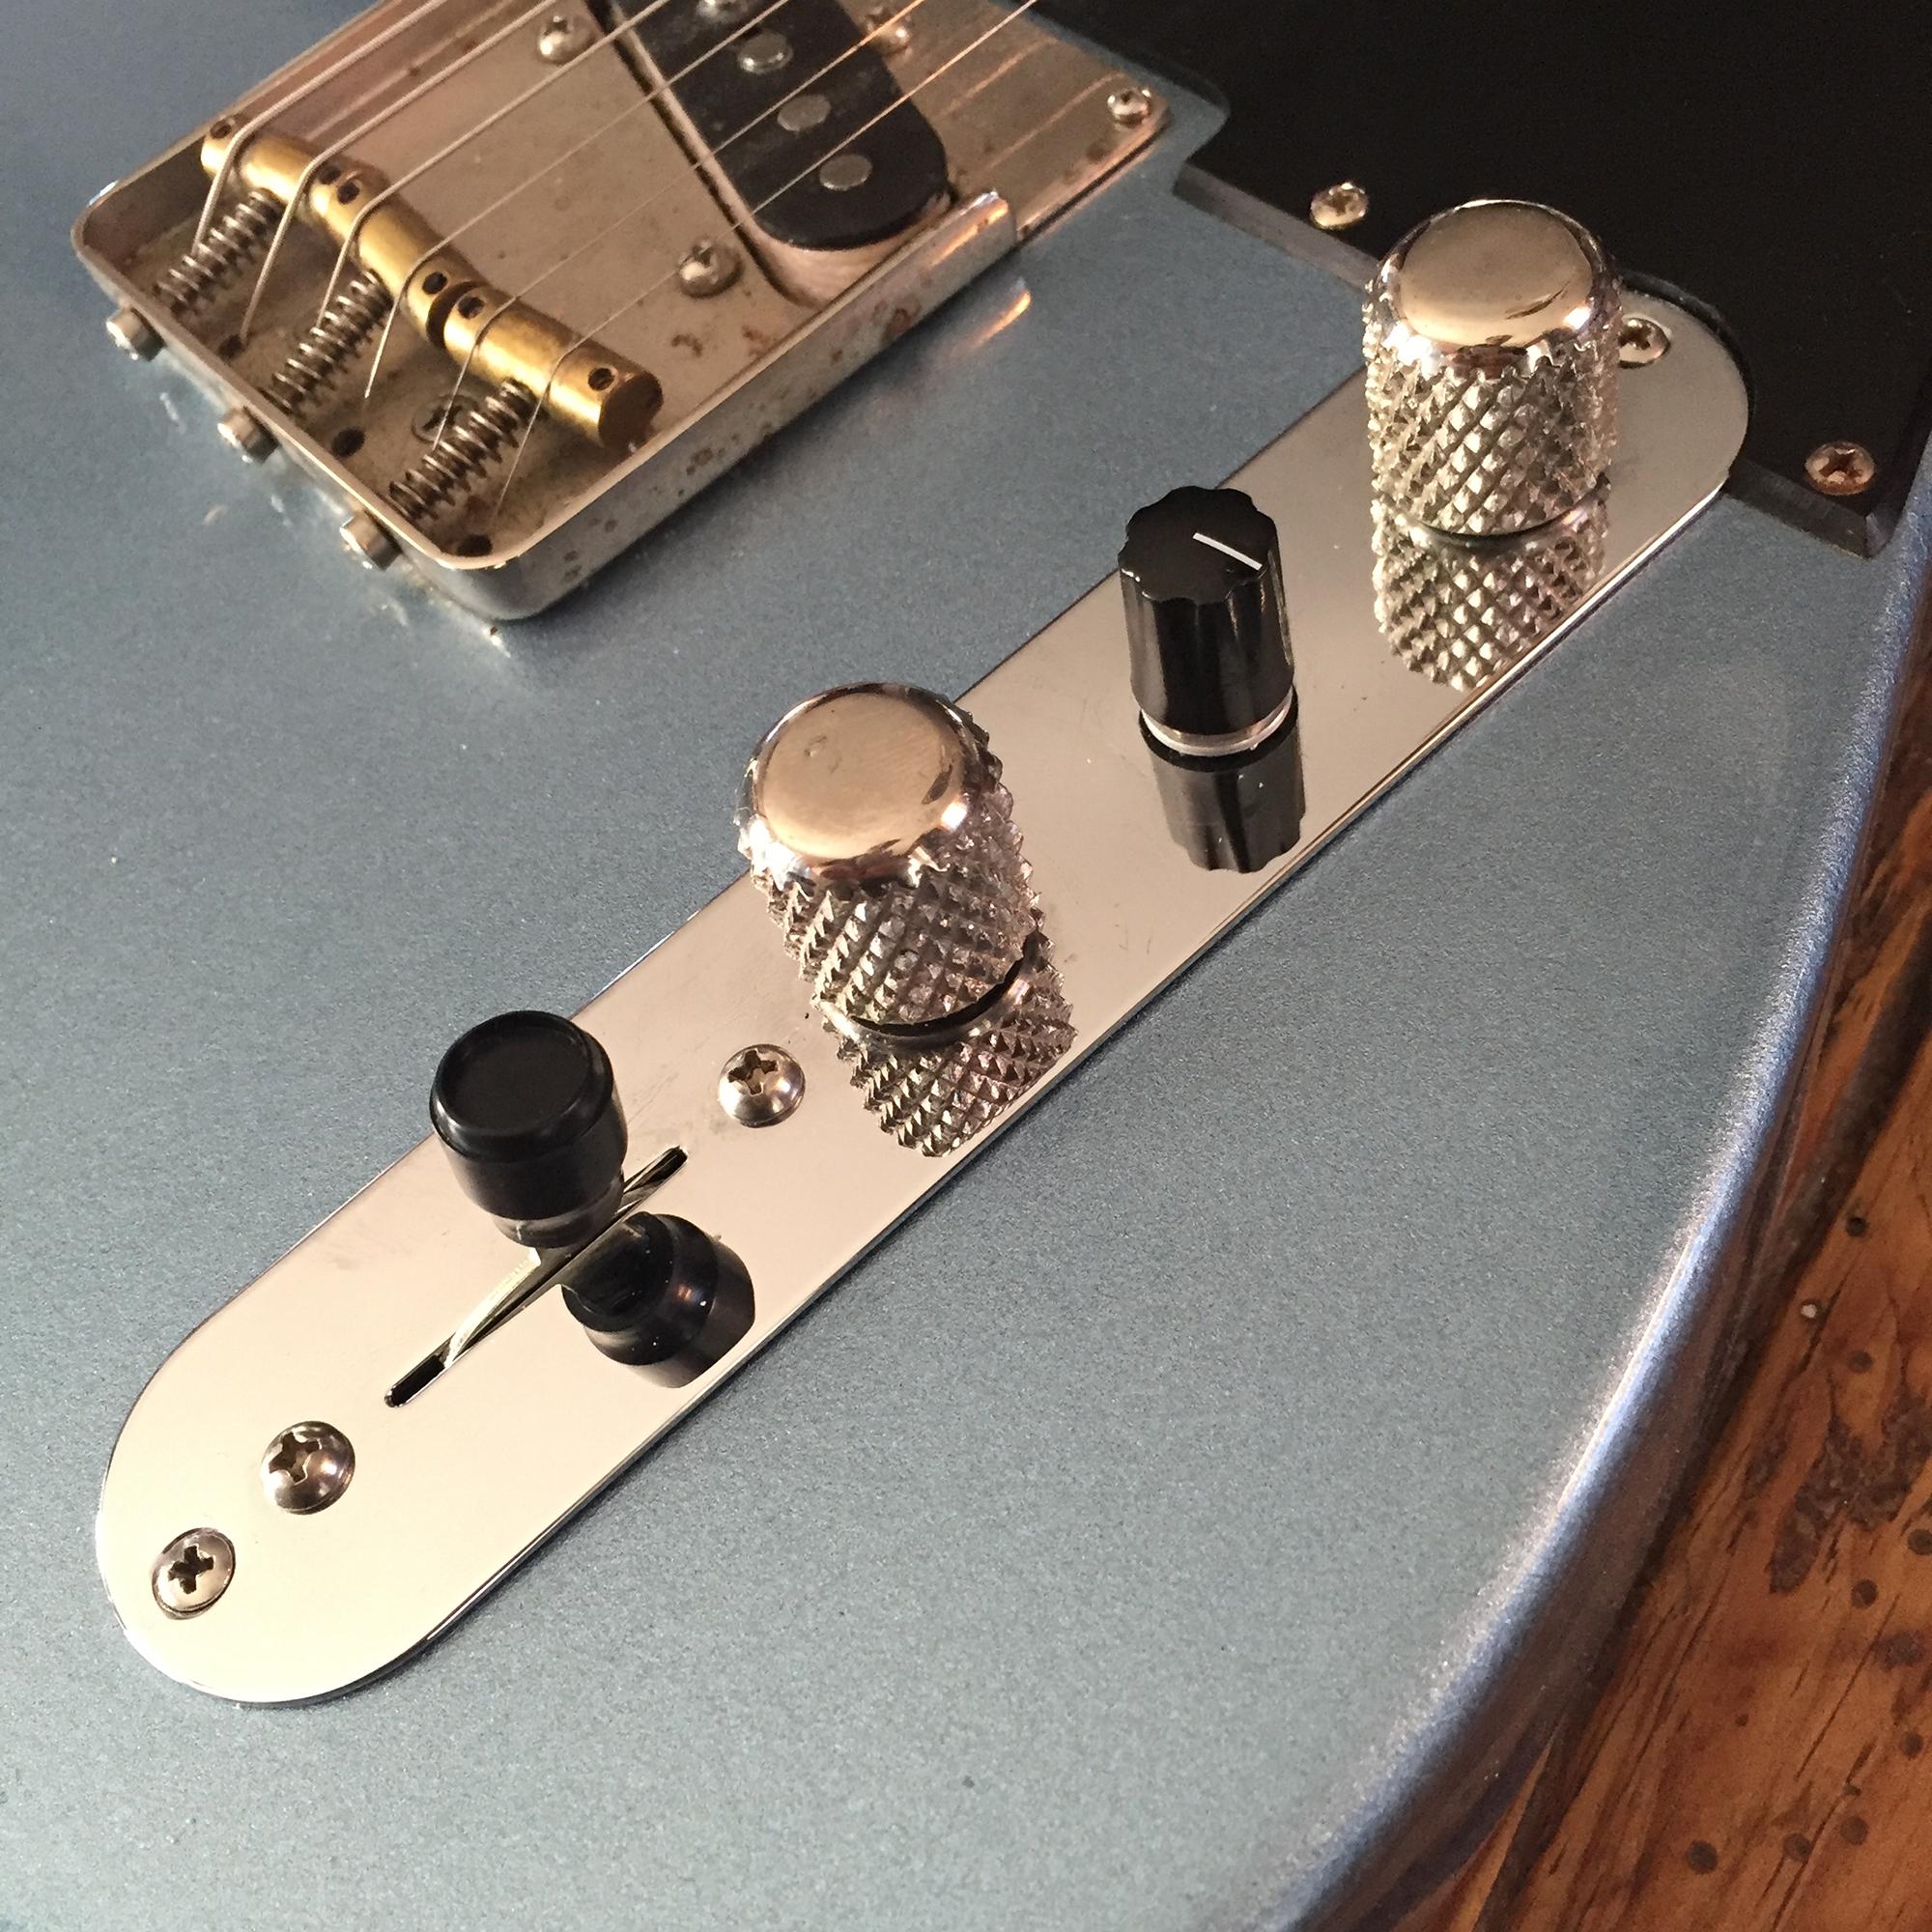 STB Super 4-Way Mod Tele Prewired Kit: Rothstein Guitars on